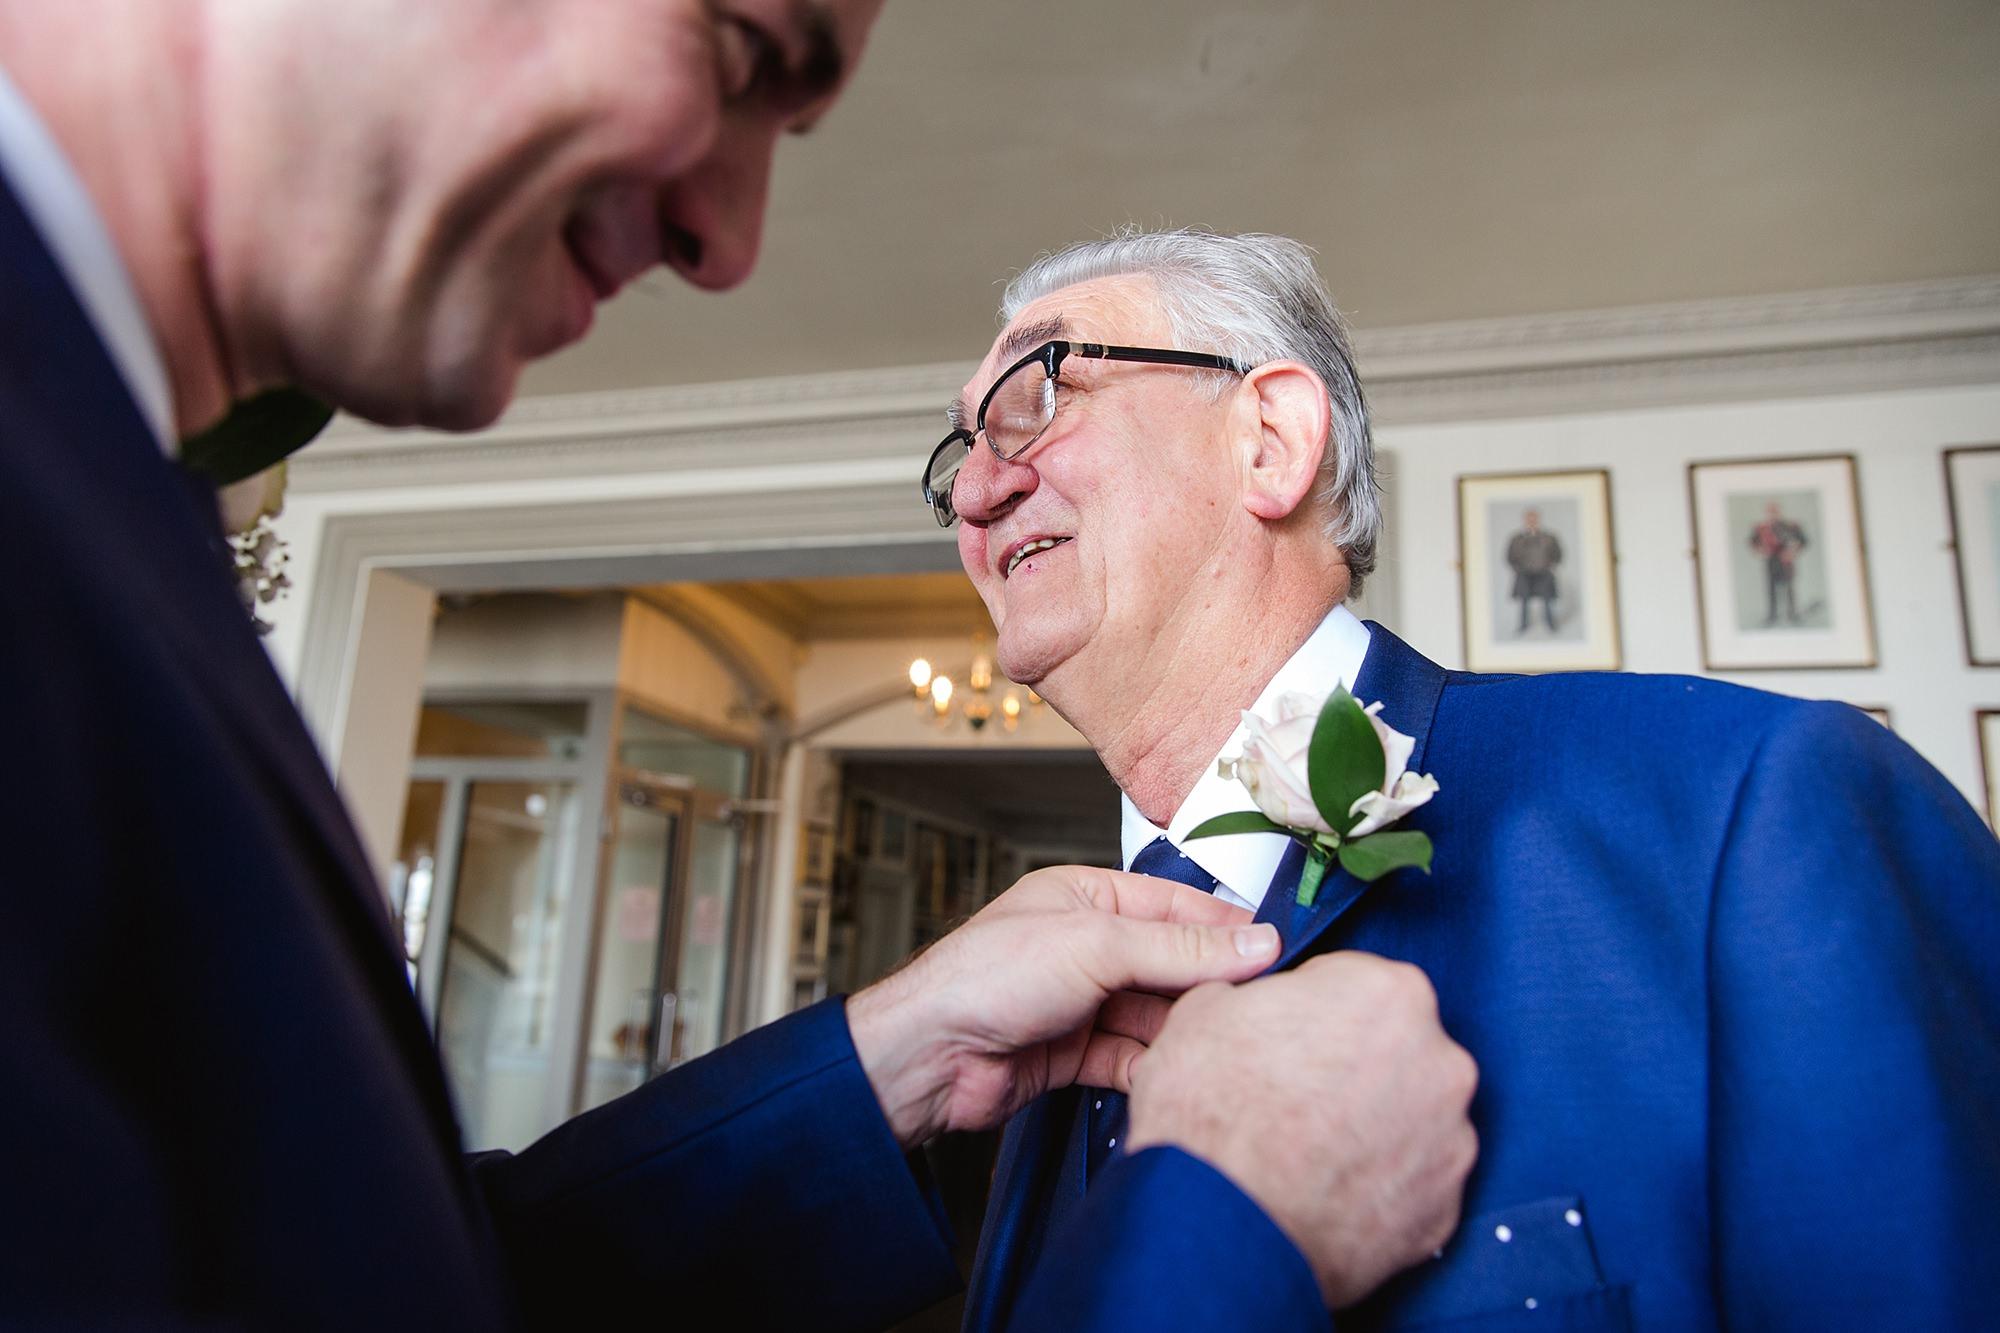 Trafalgar Tavern wedding groom puts on his father's buttonhole